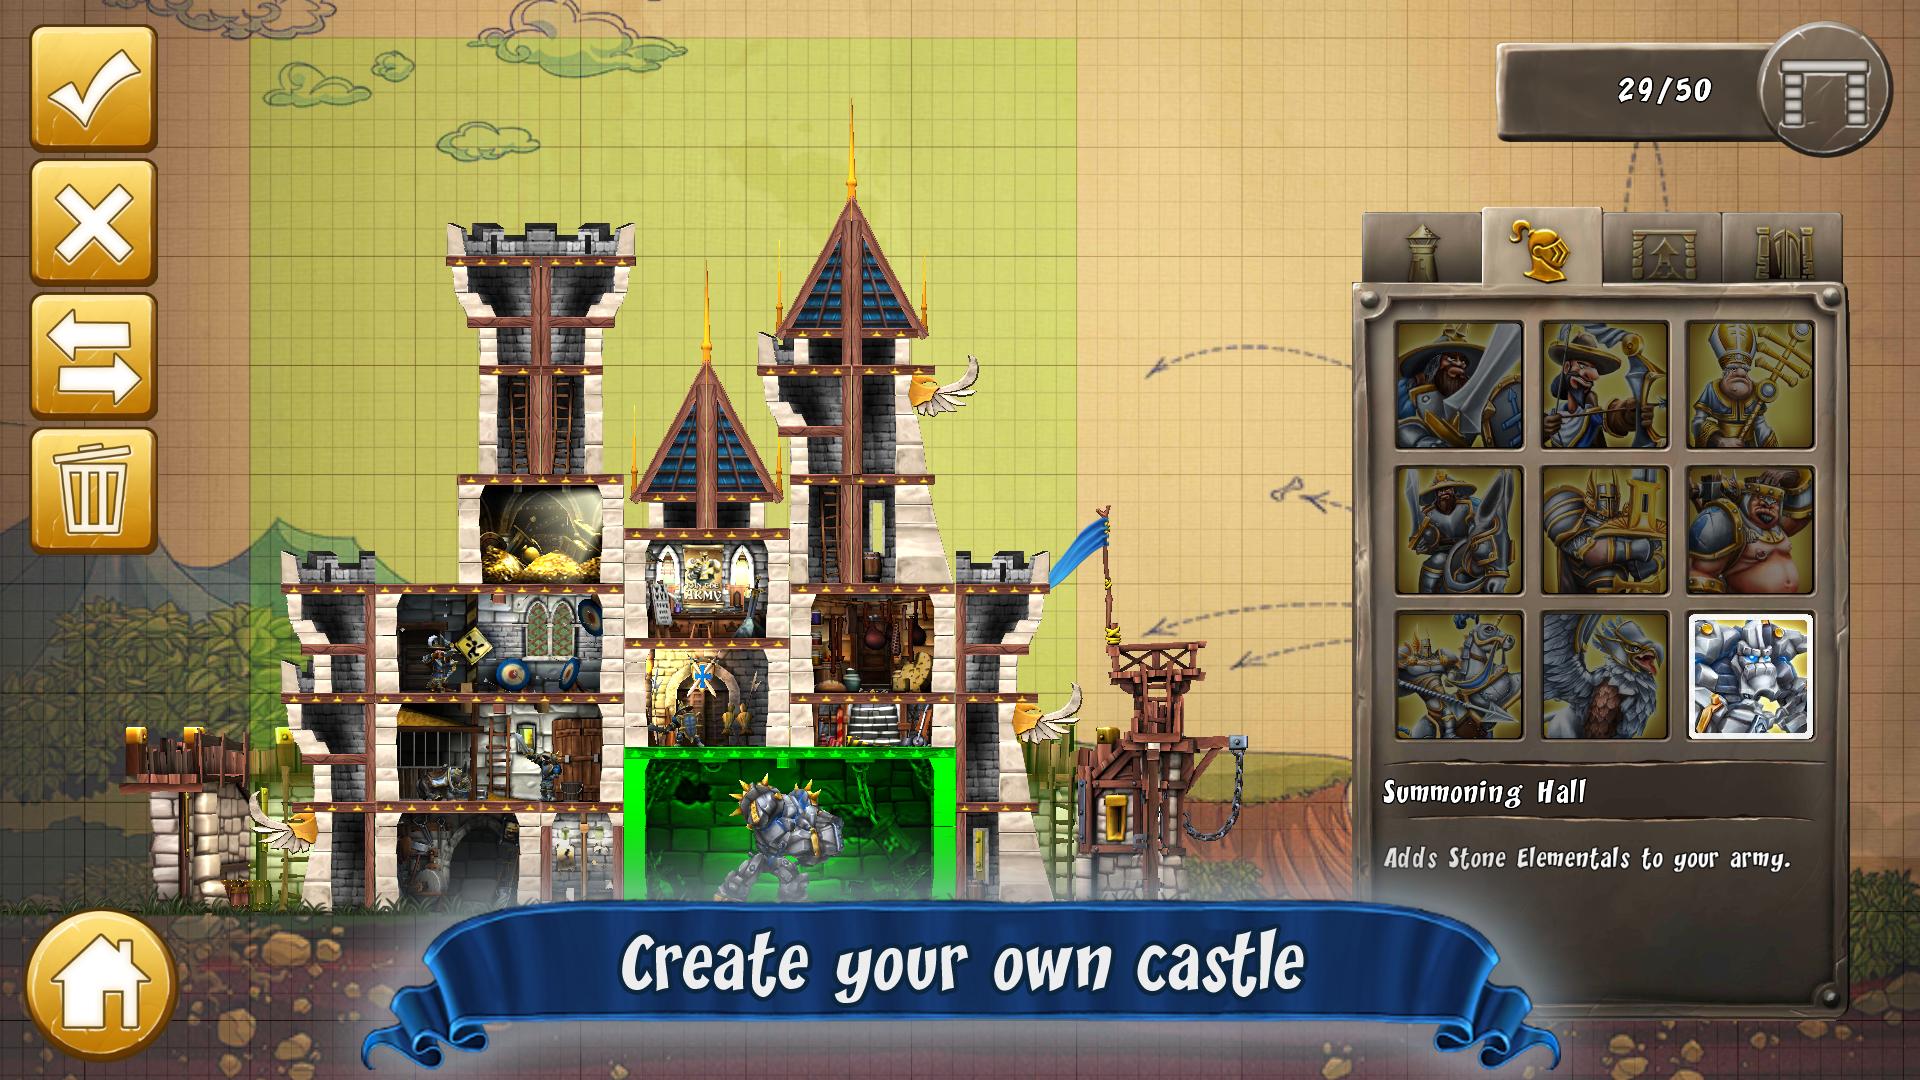 CastleStorm - Free to Siege screenshot #11